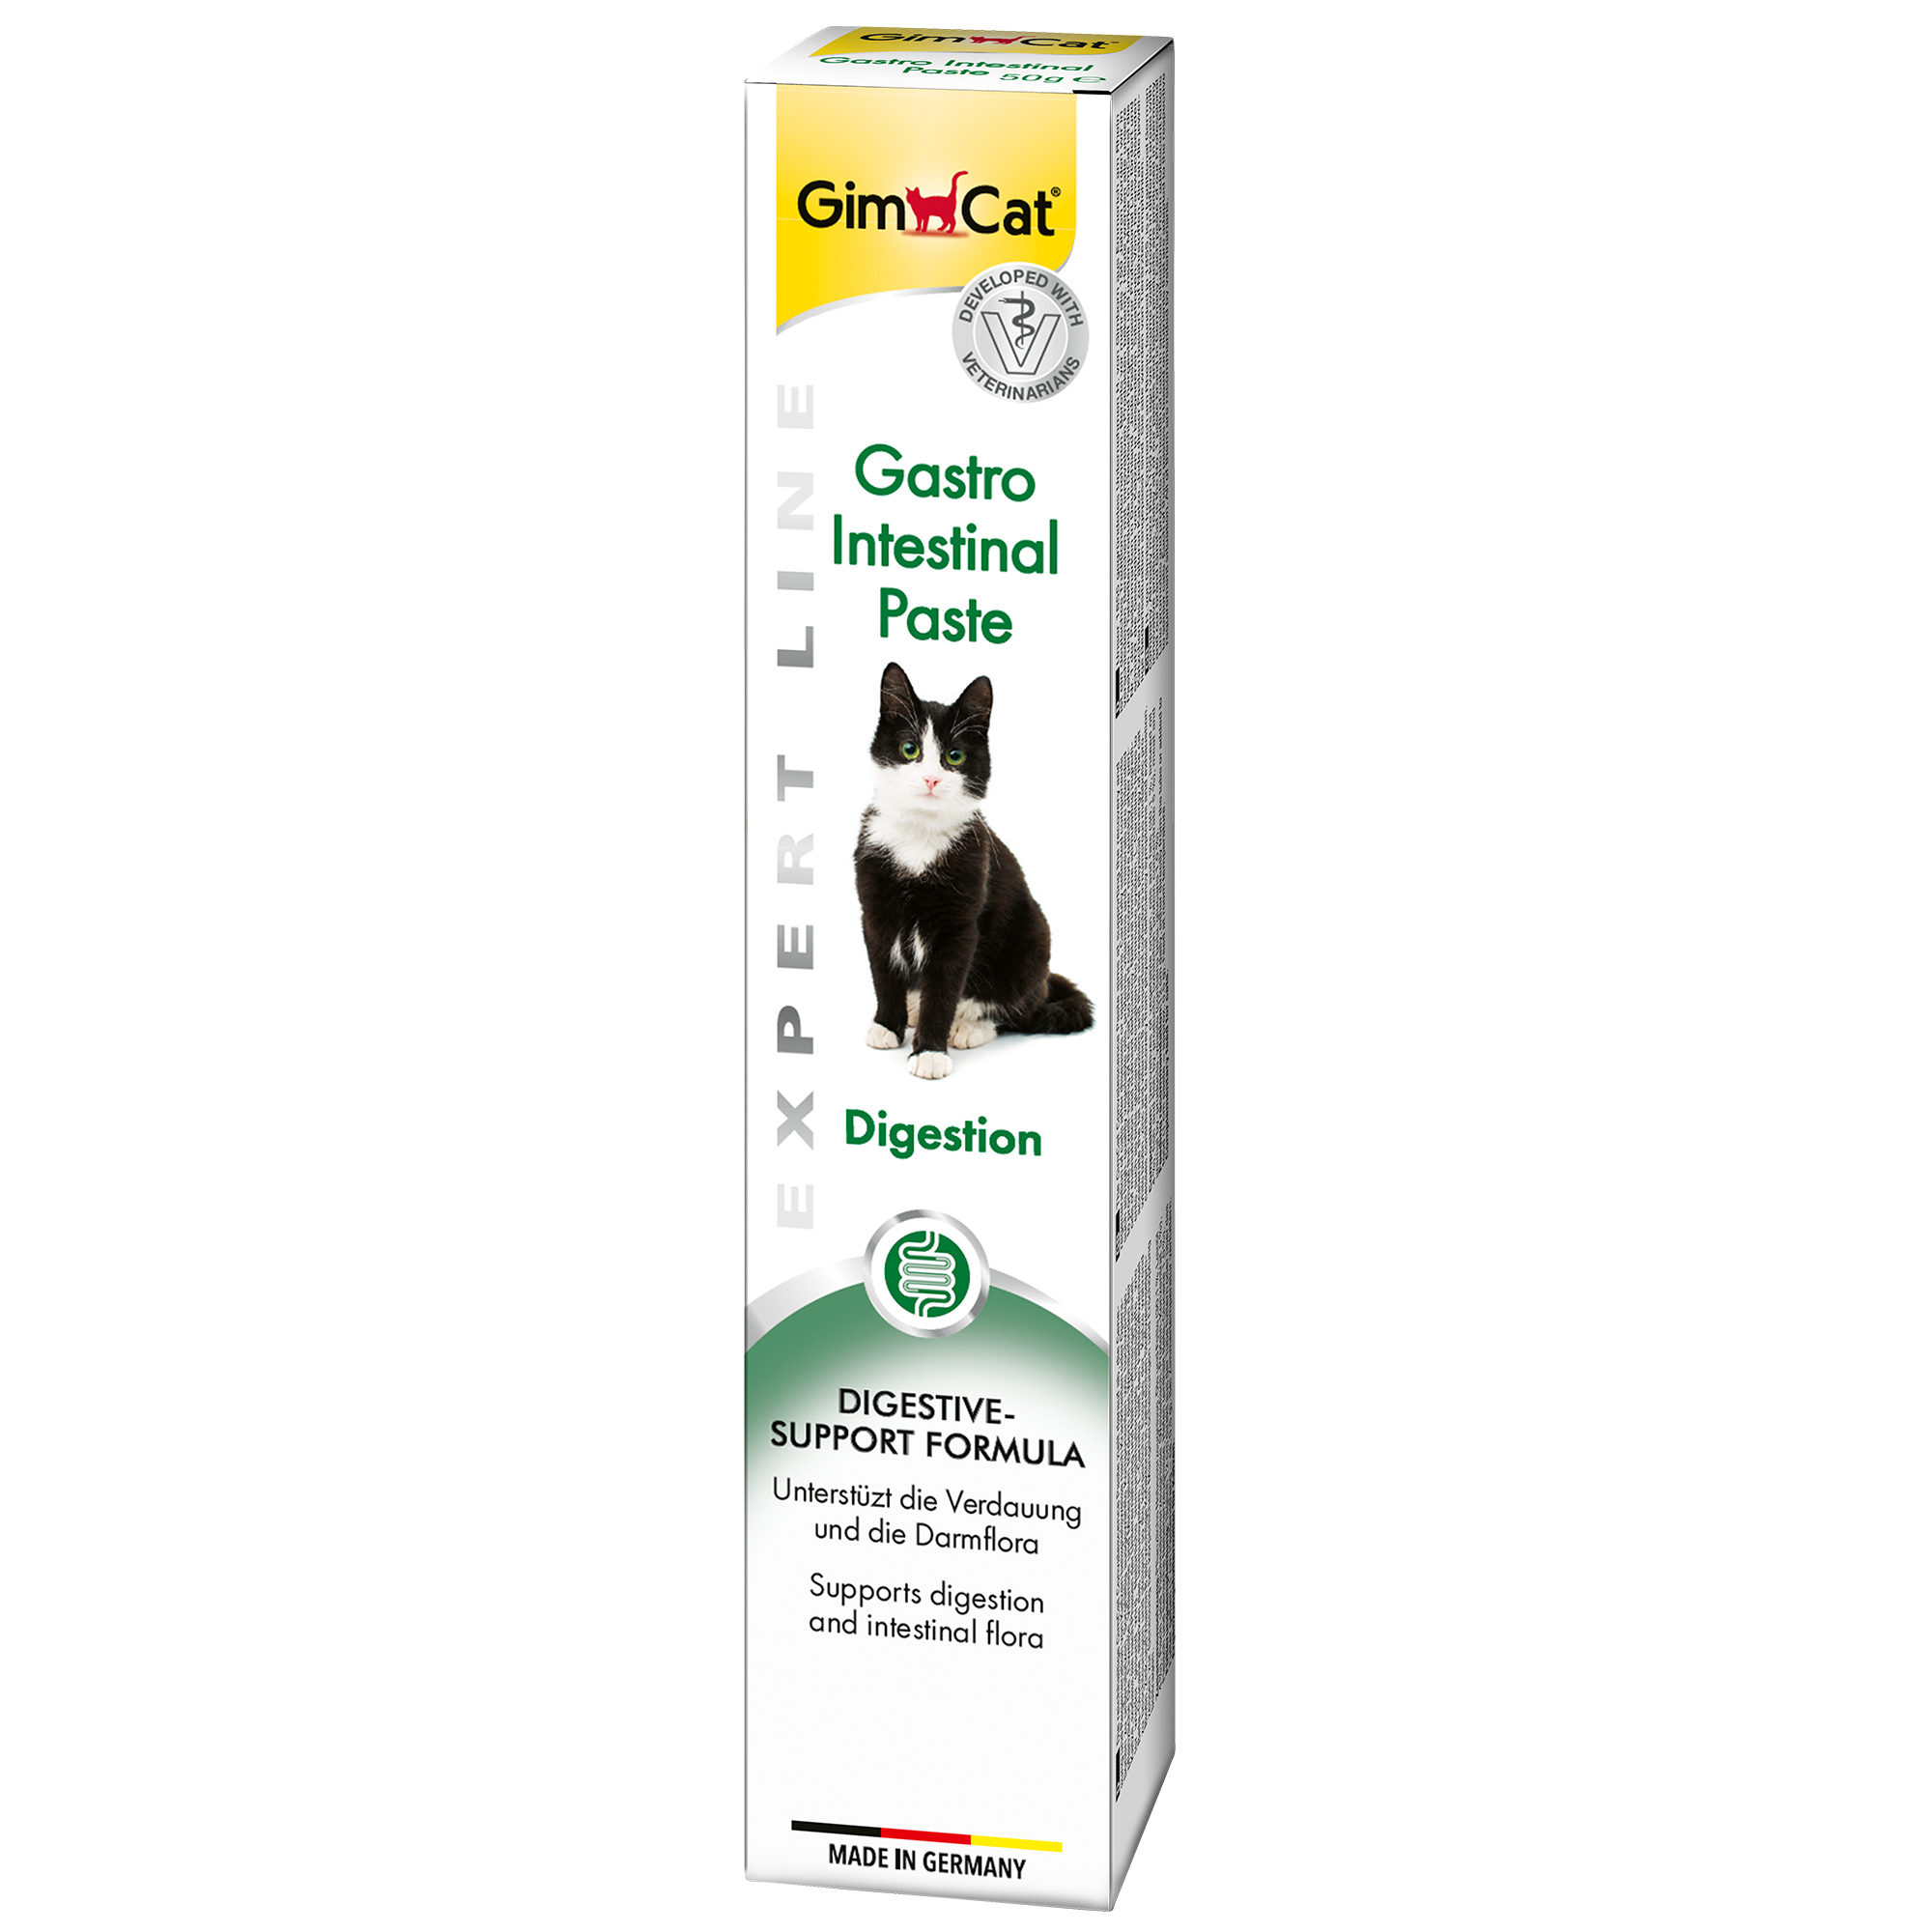 GimCat Gastro Intestinal Paste 50g